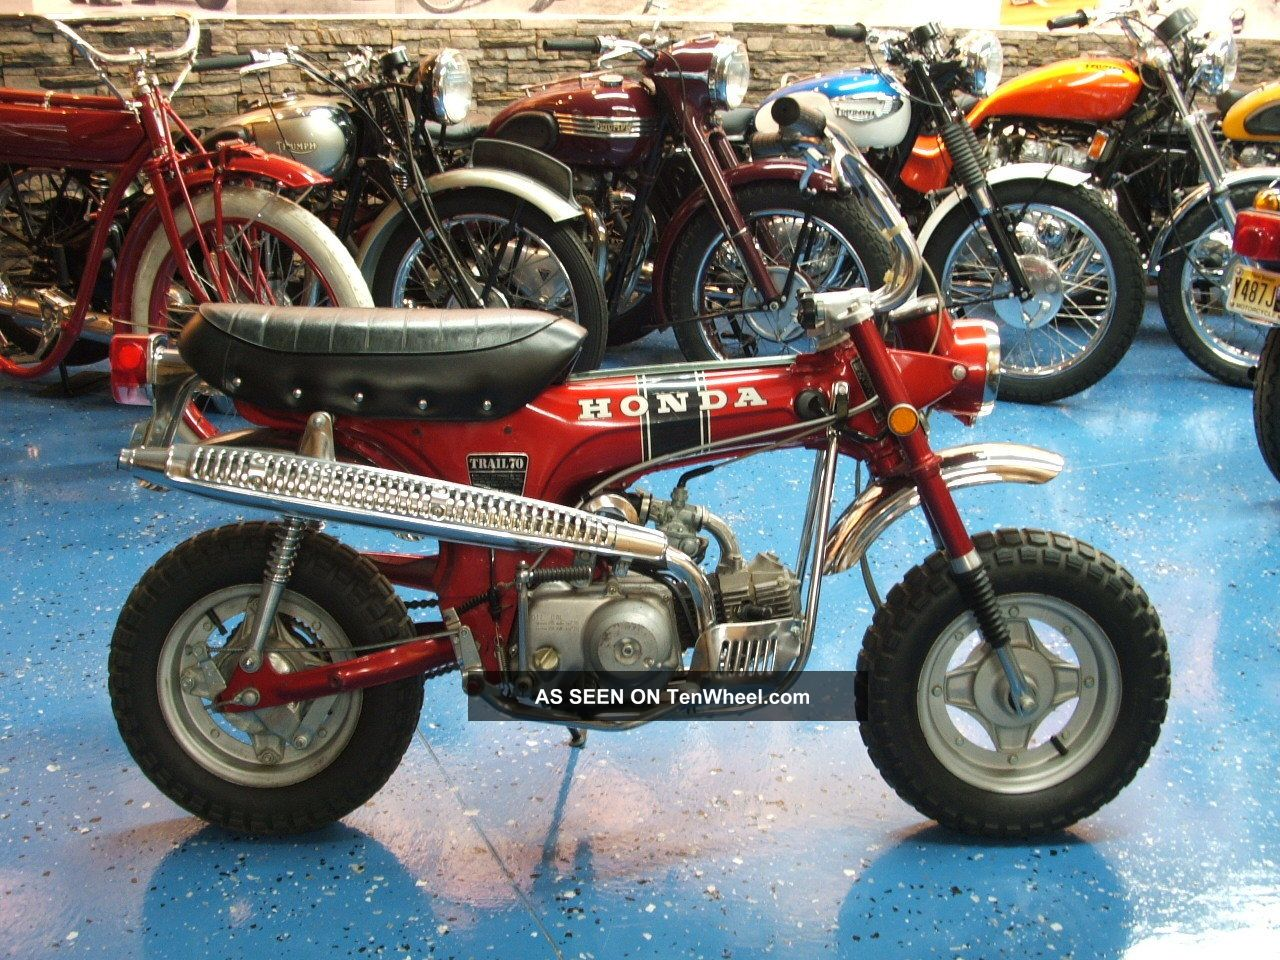 Honda 1970 Ct 70 Mini Trail Ct70 3 Spd Red Bike